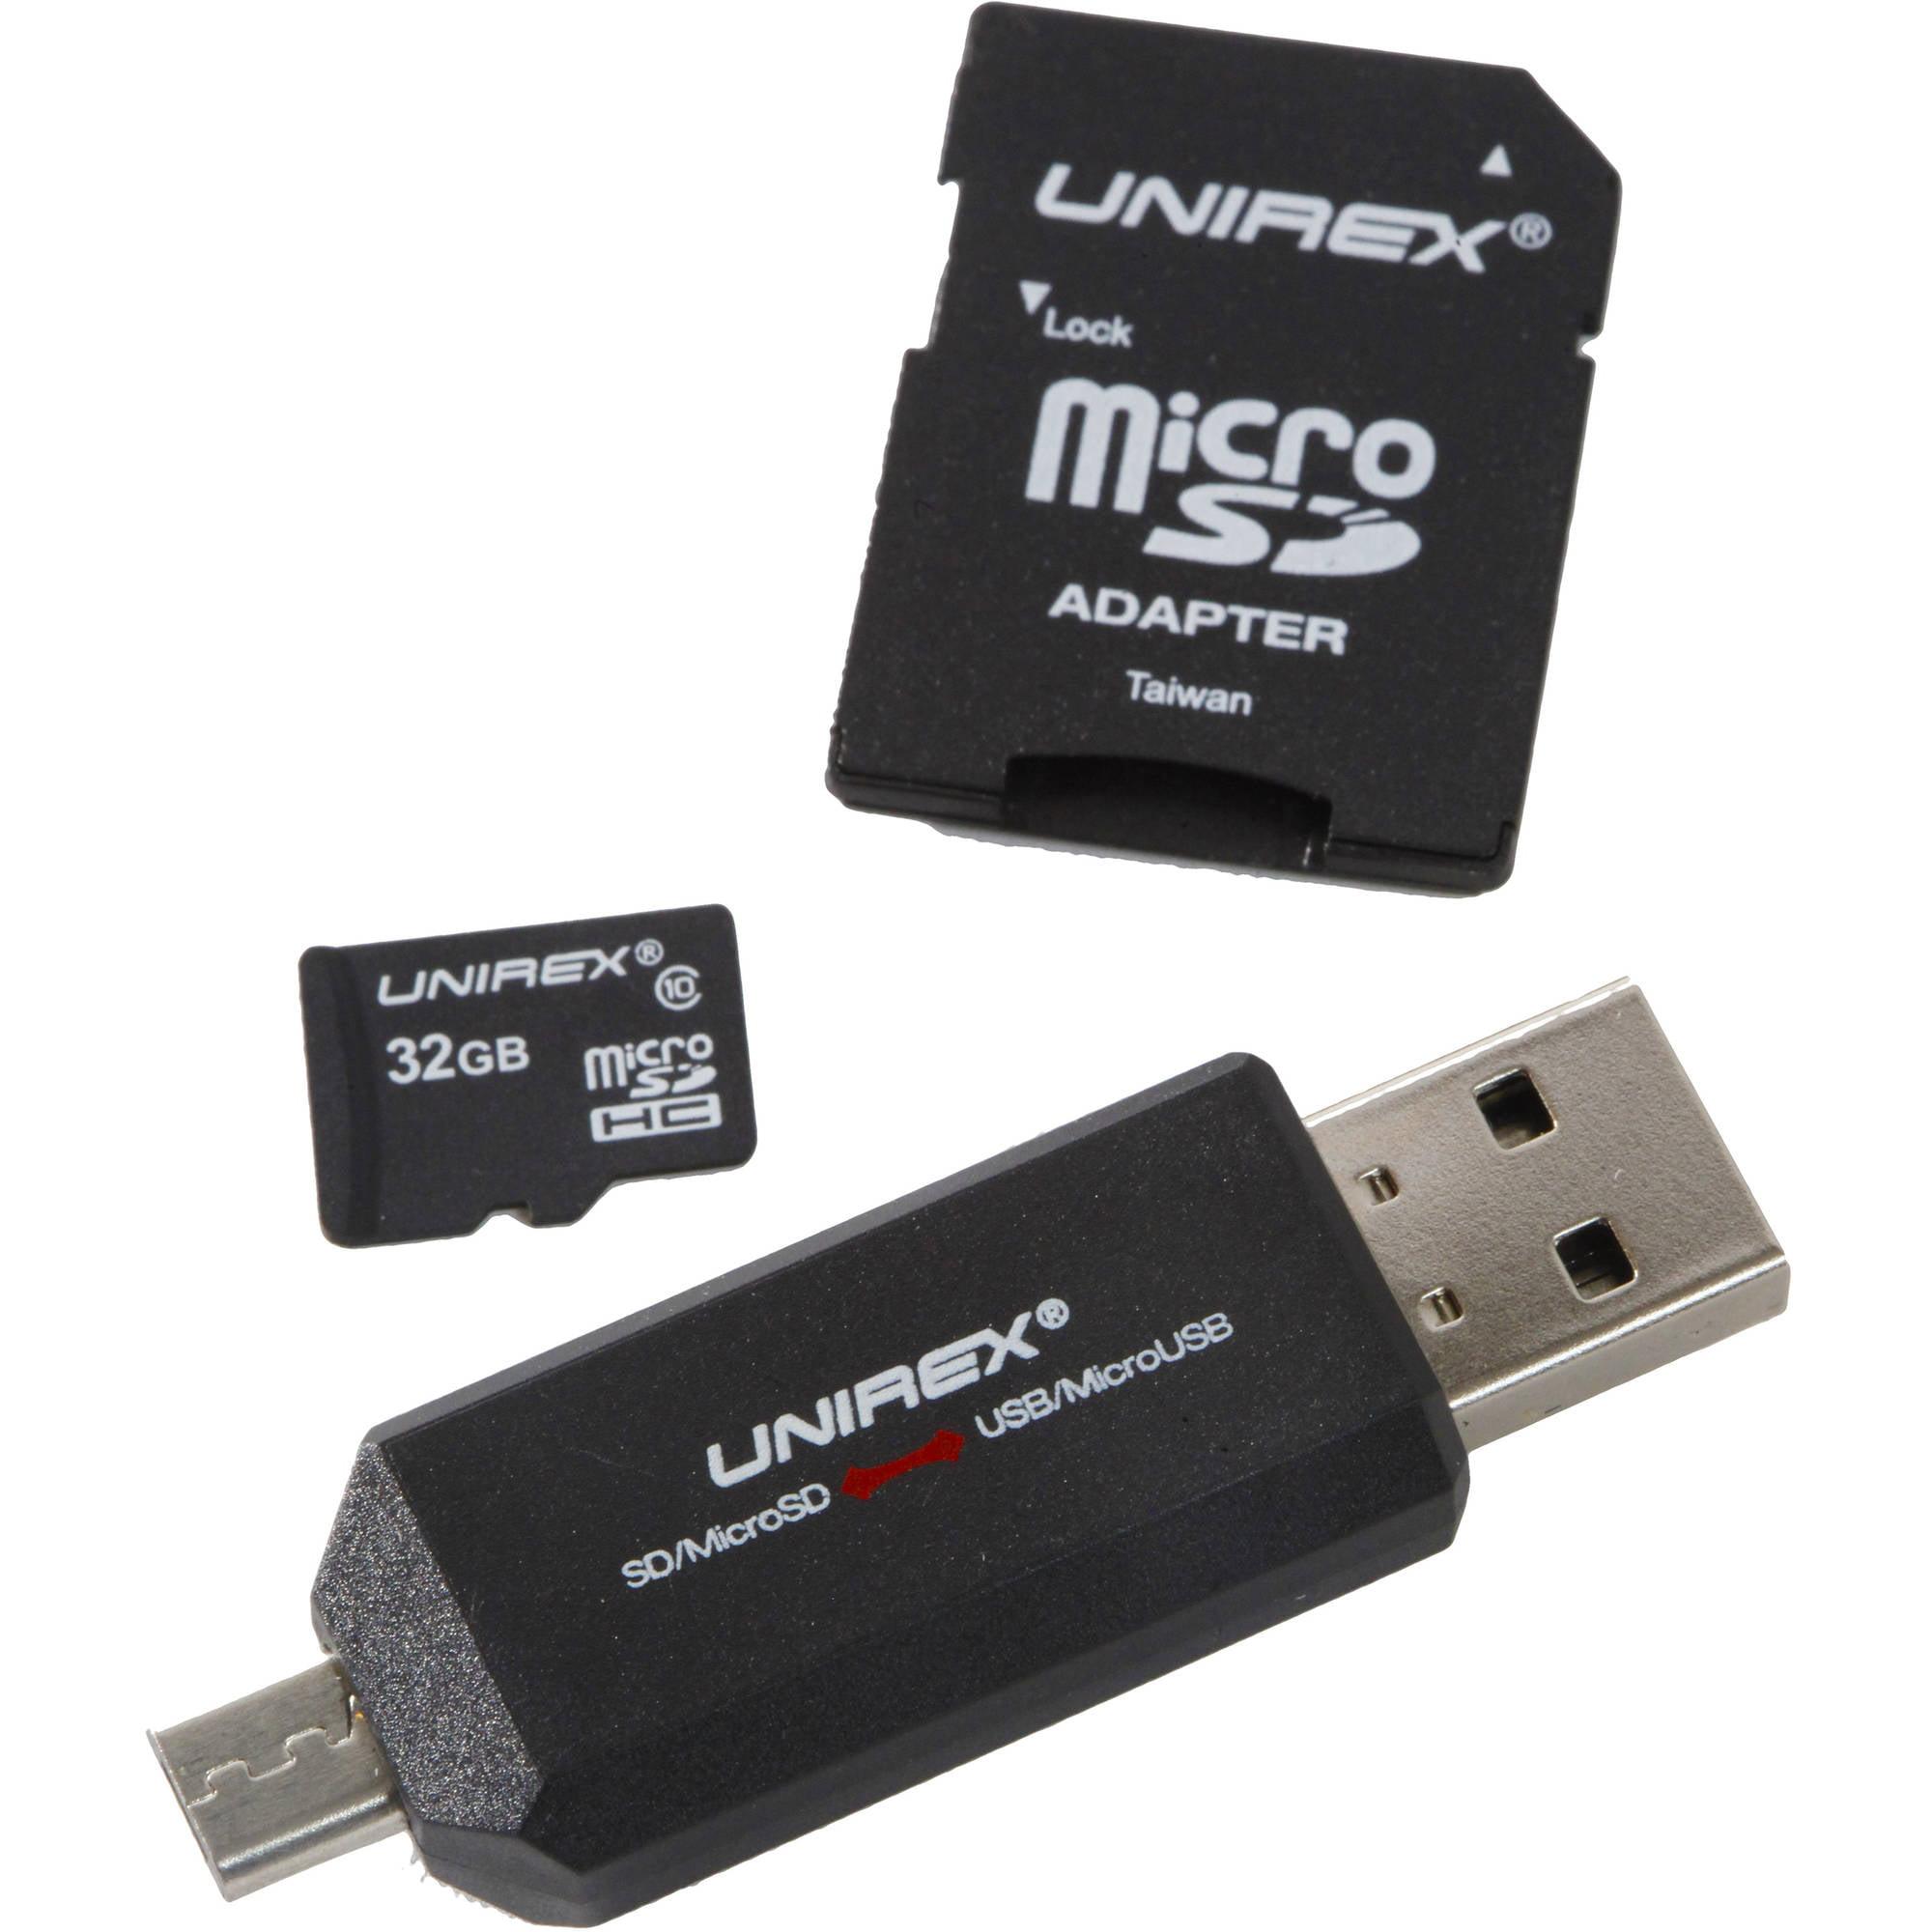 Unirex microSD 32GB Class 10 with USB/microUSB Reader